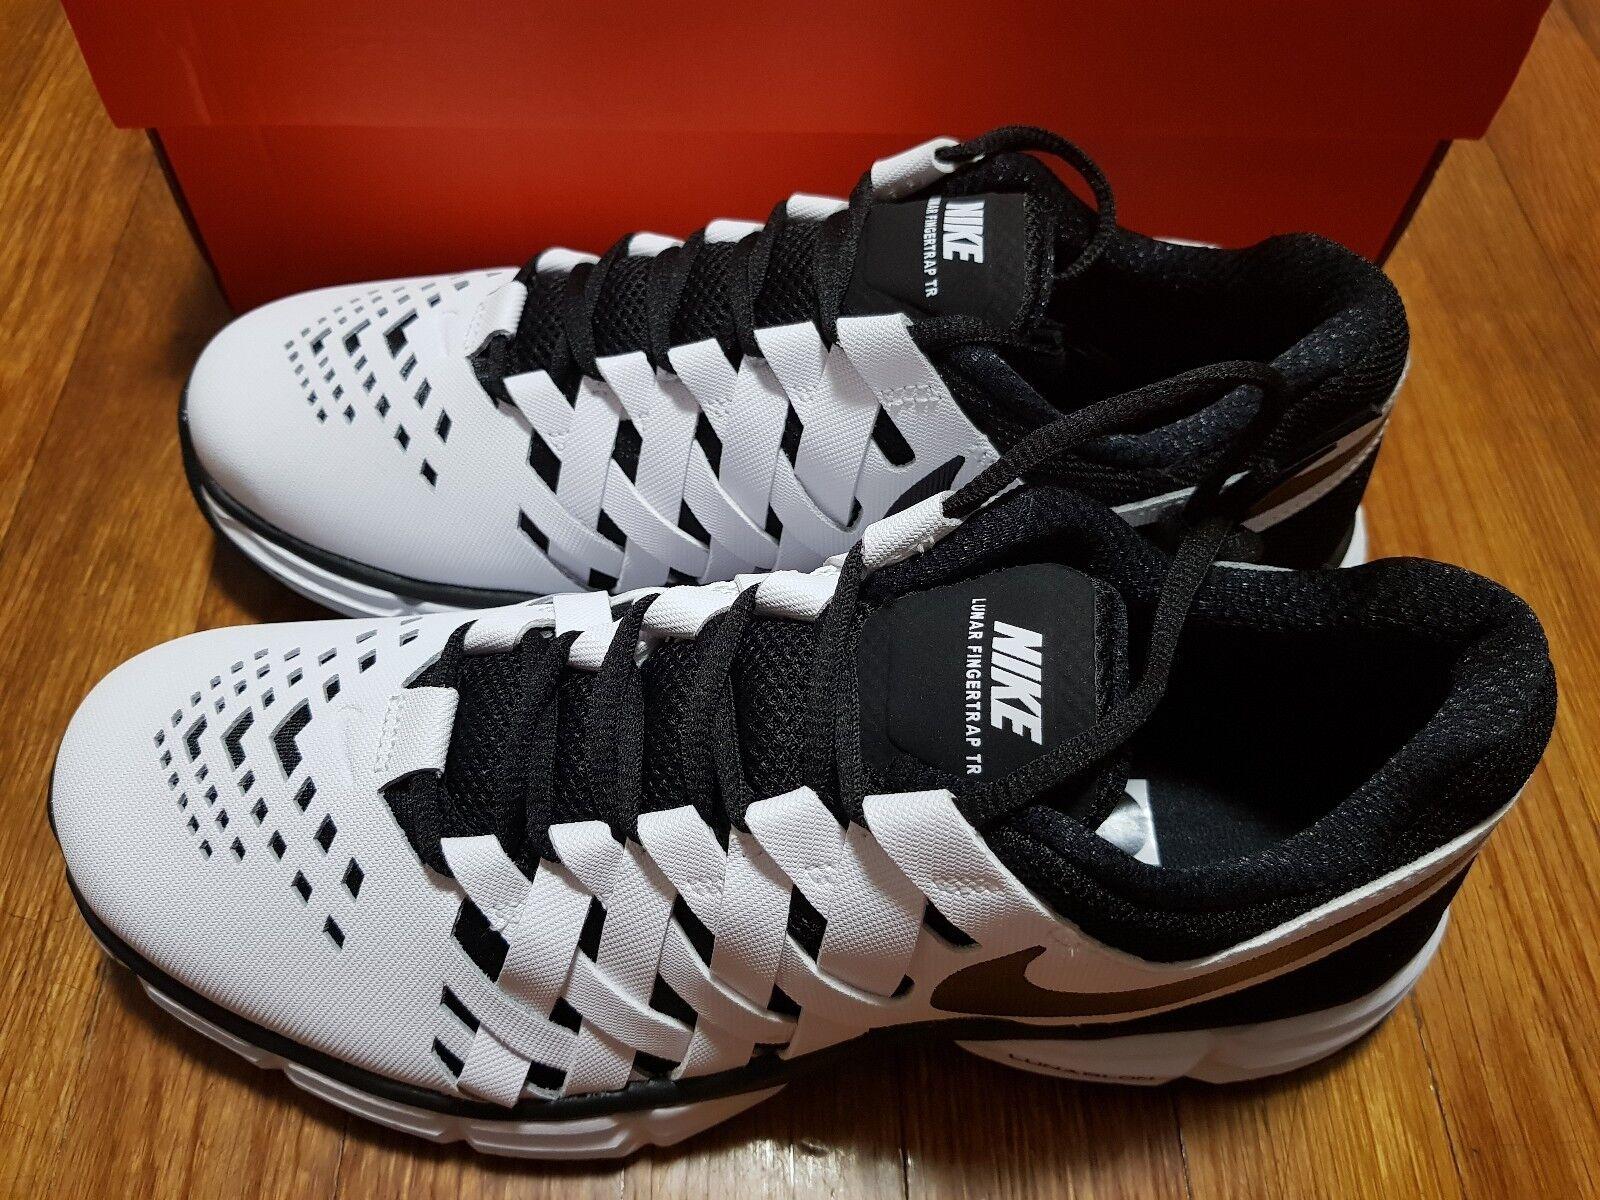 Nike Men's Lunar Fingertrap Tr Training Shoe white & black 898066 100 Comfortable Wild casual shoes